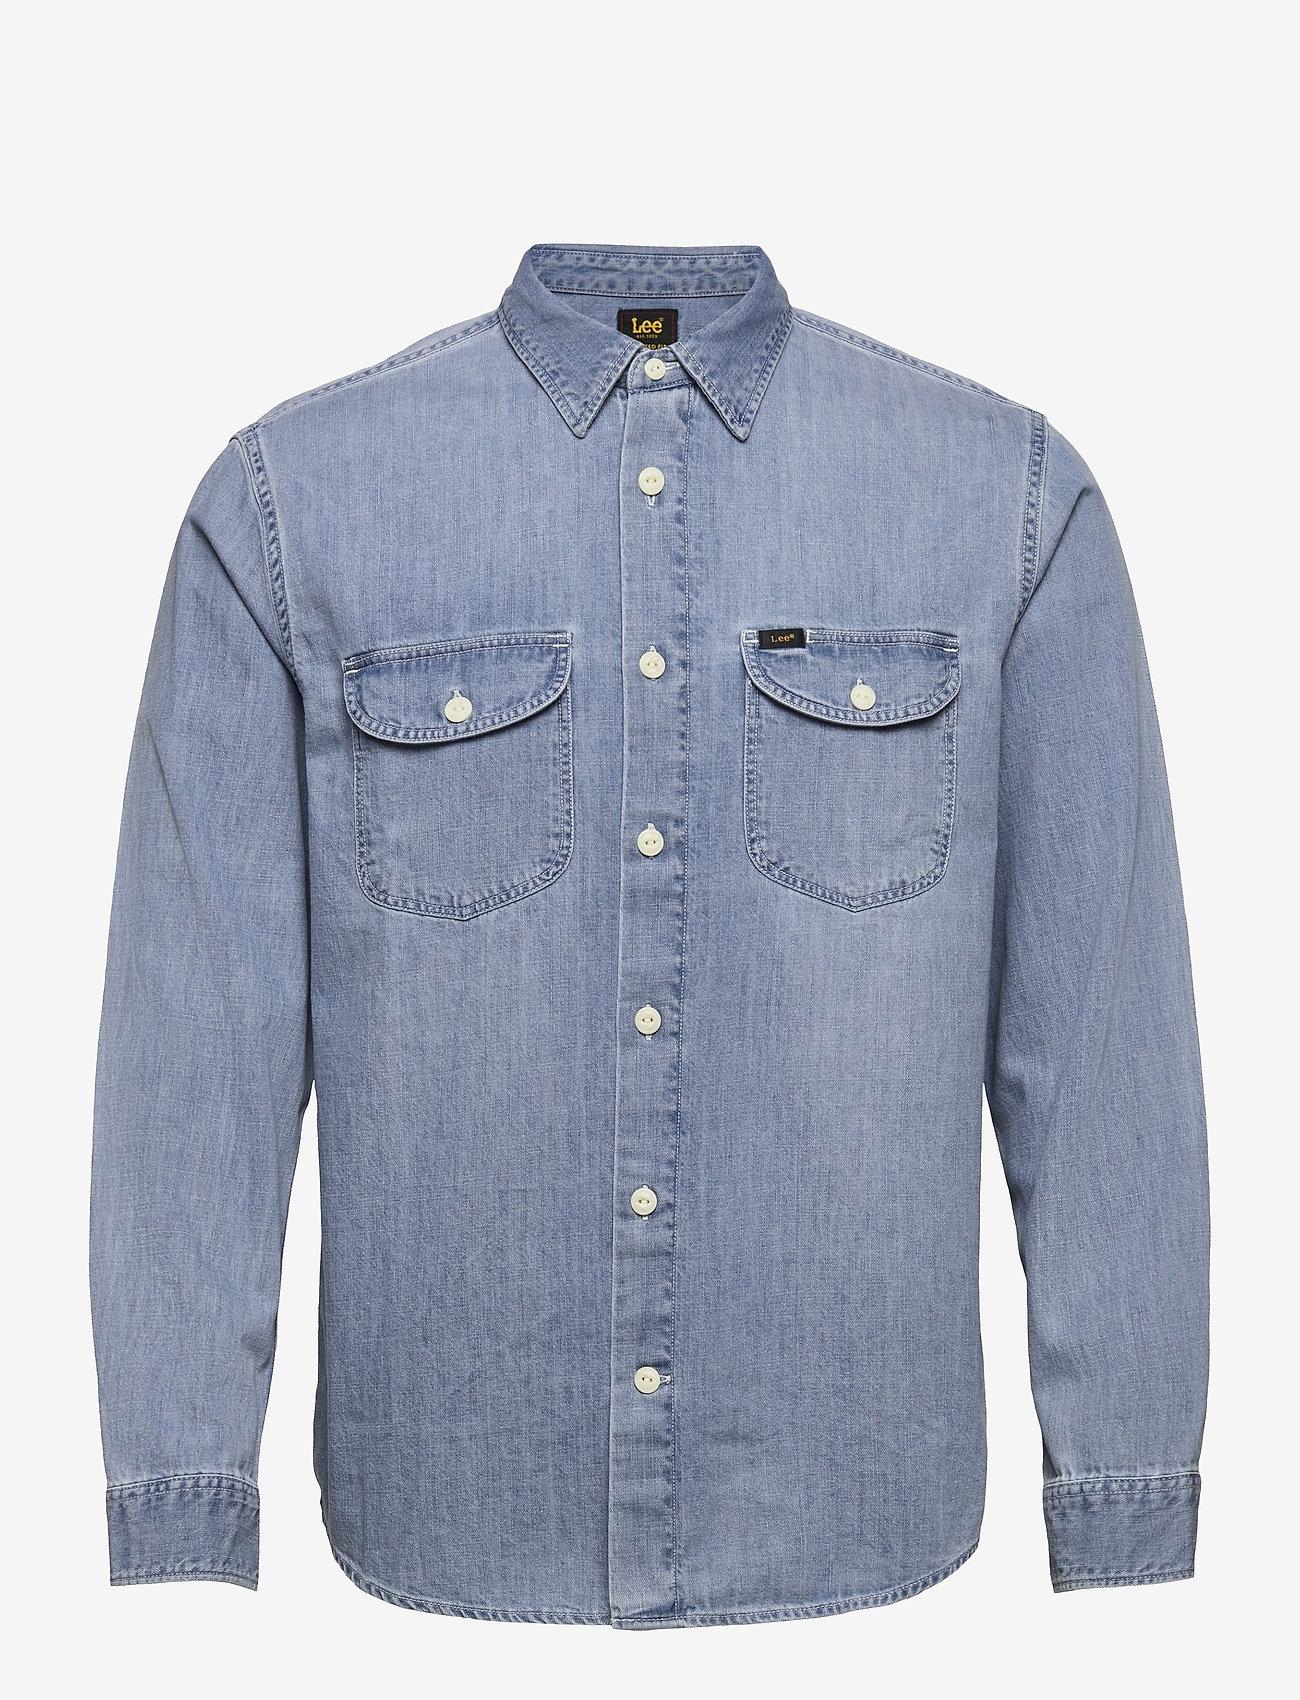 Lee Jeans - WORKER SHIRT - denim shirts - frost blue - 0